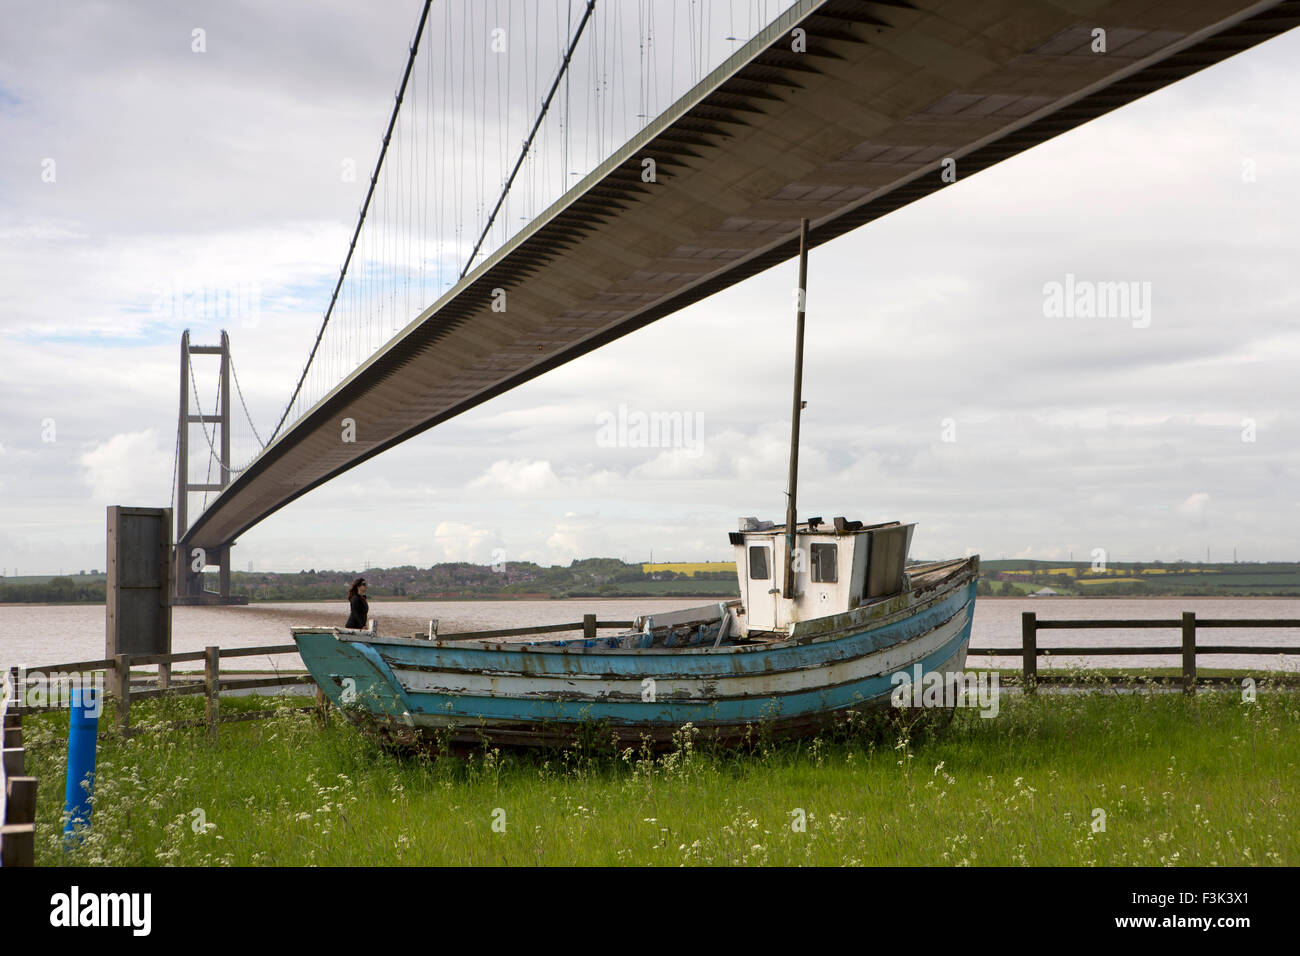 UK, England, Yorkshire East Riding, Hessle, old fishing boat below Humber Suspension Bridge Stock Photo